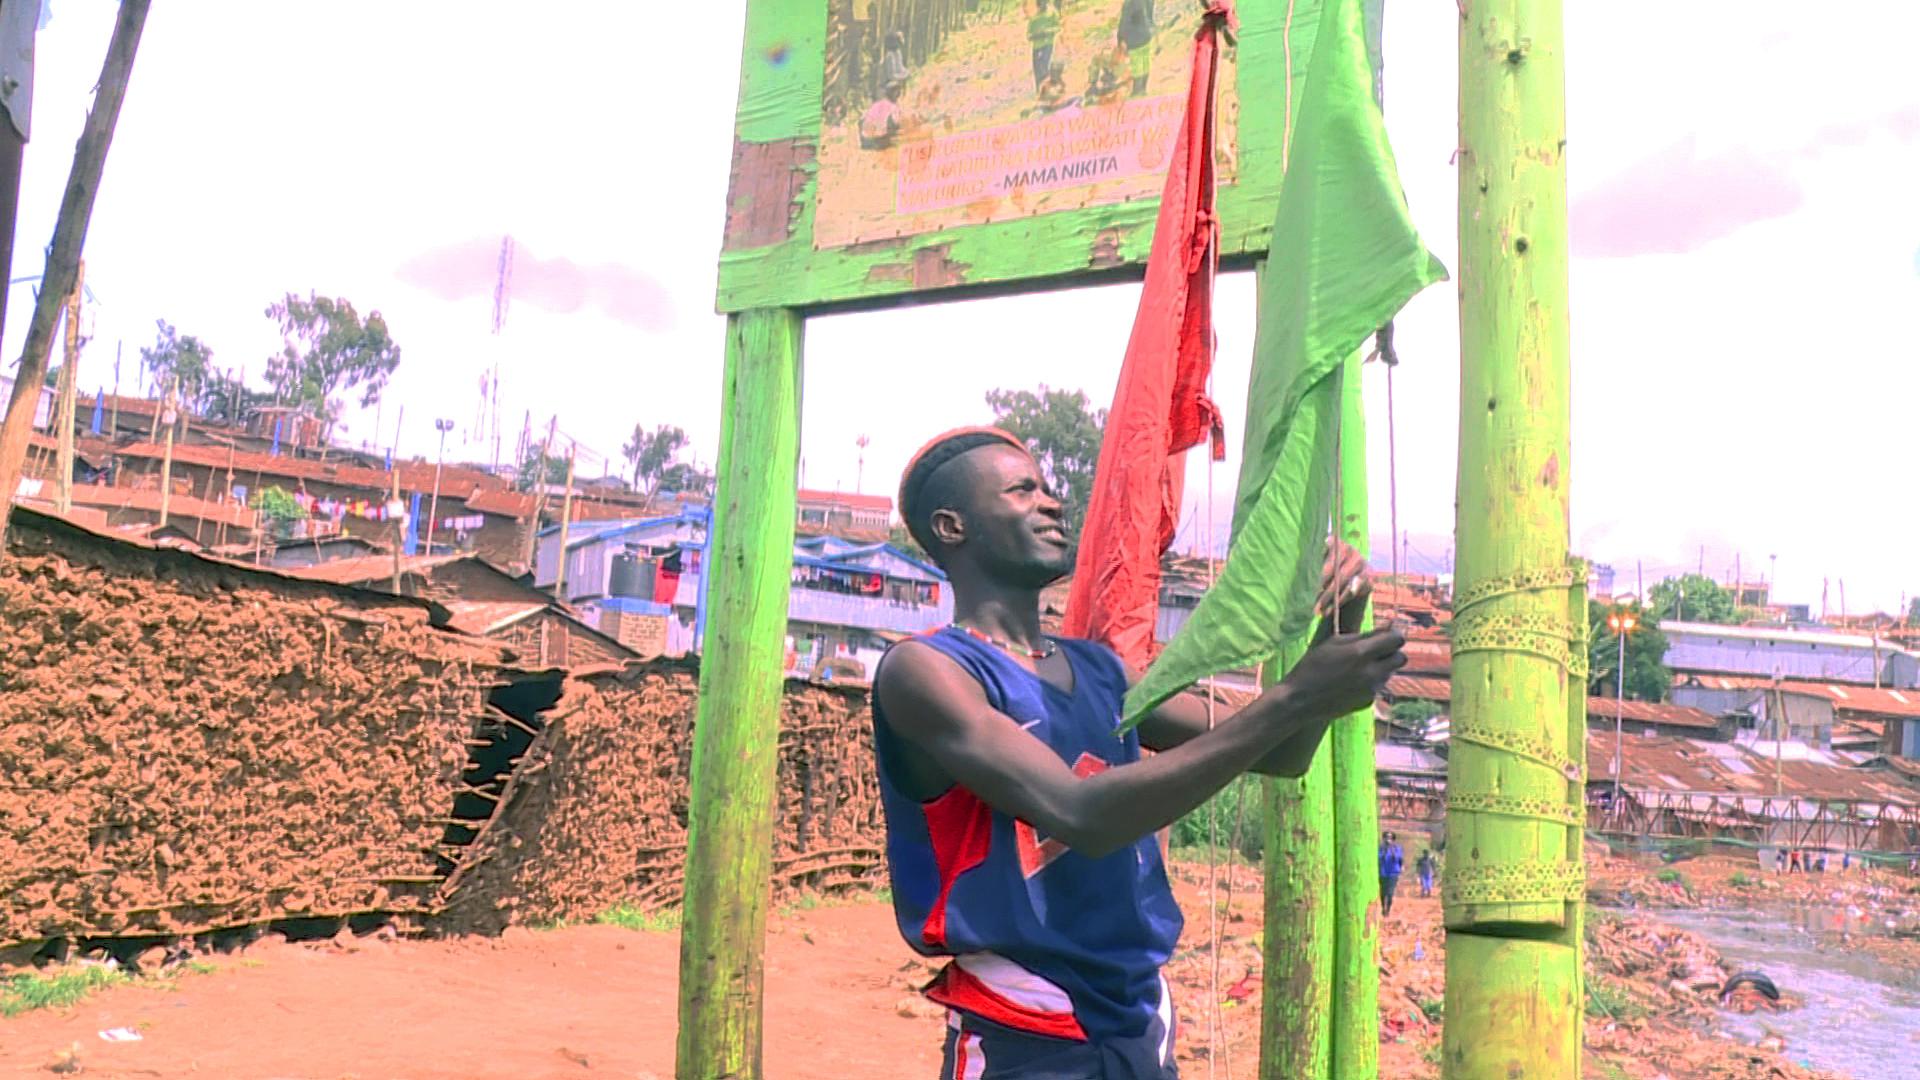 Kenya: Warning Kibera residents of floods using flags, Whatsapp and Facebook forecasts